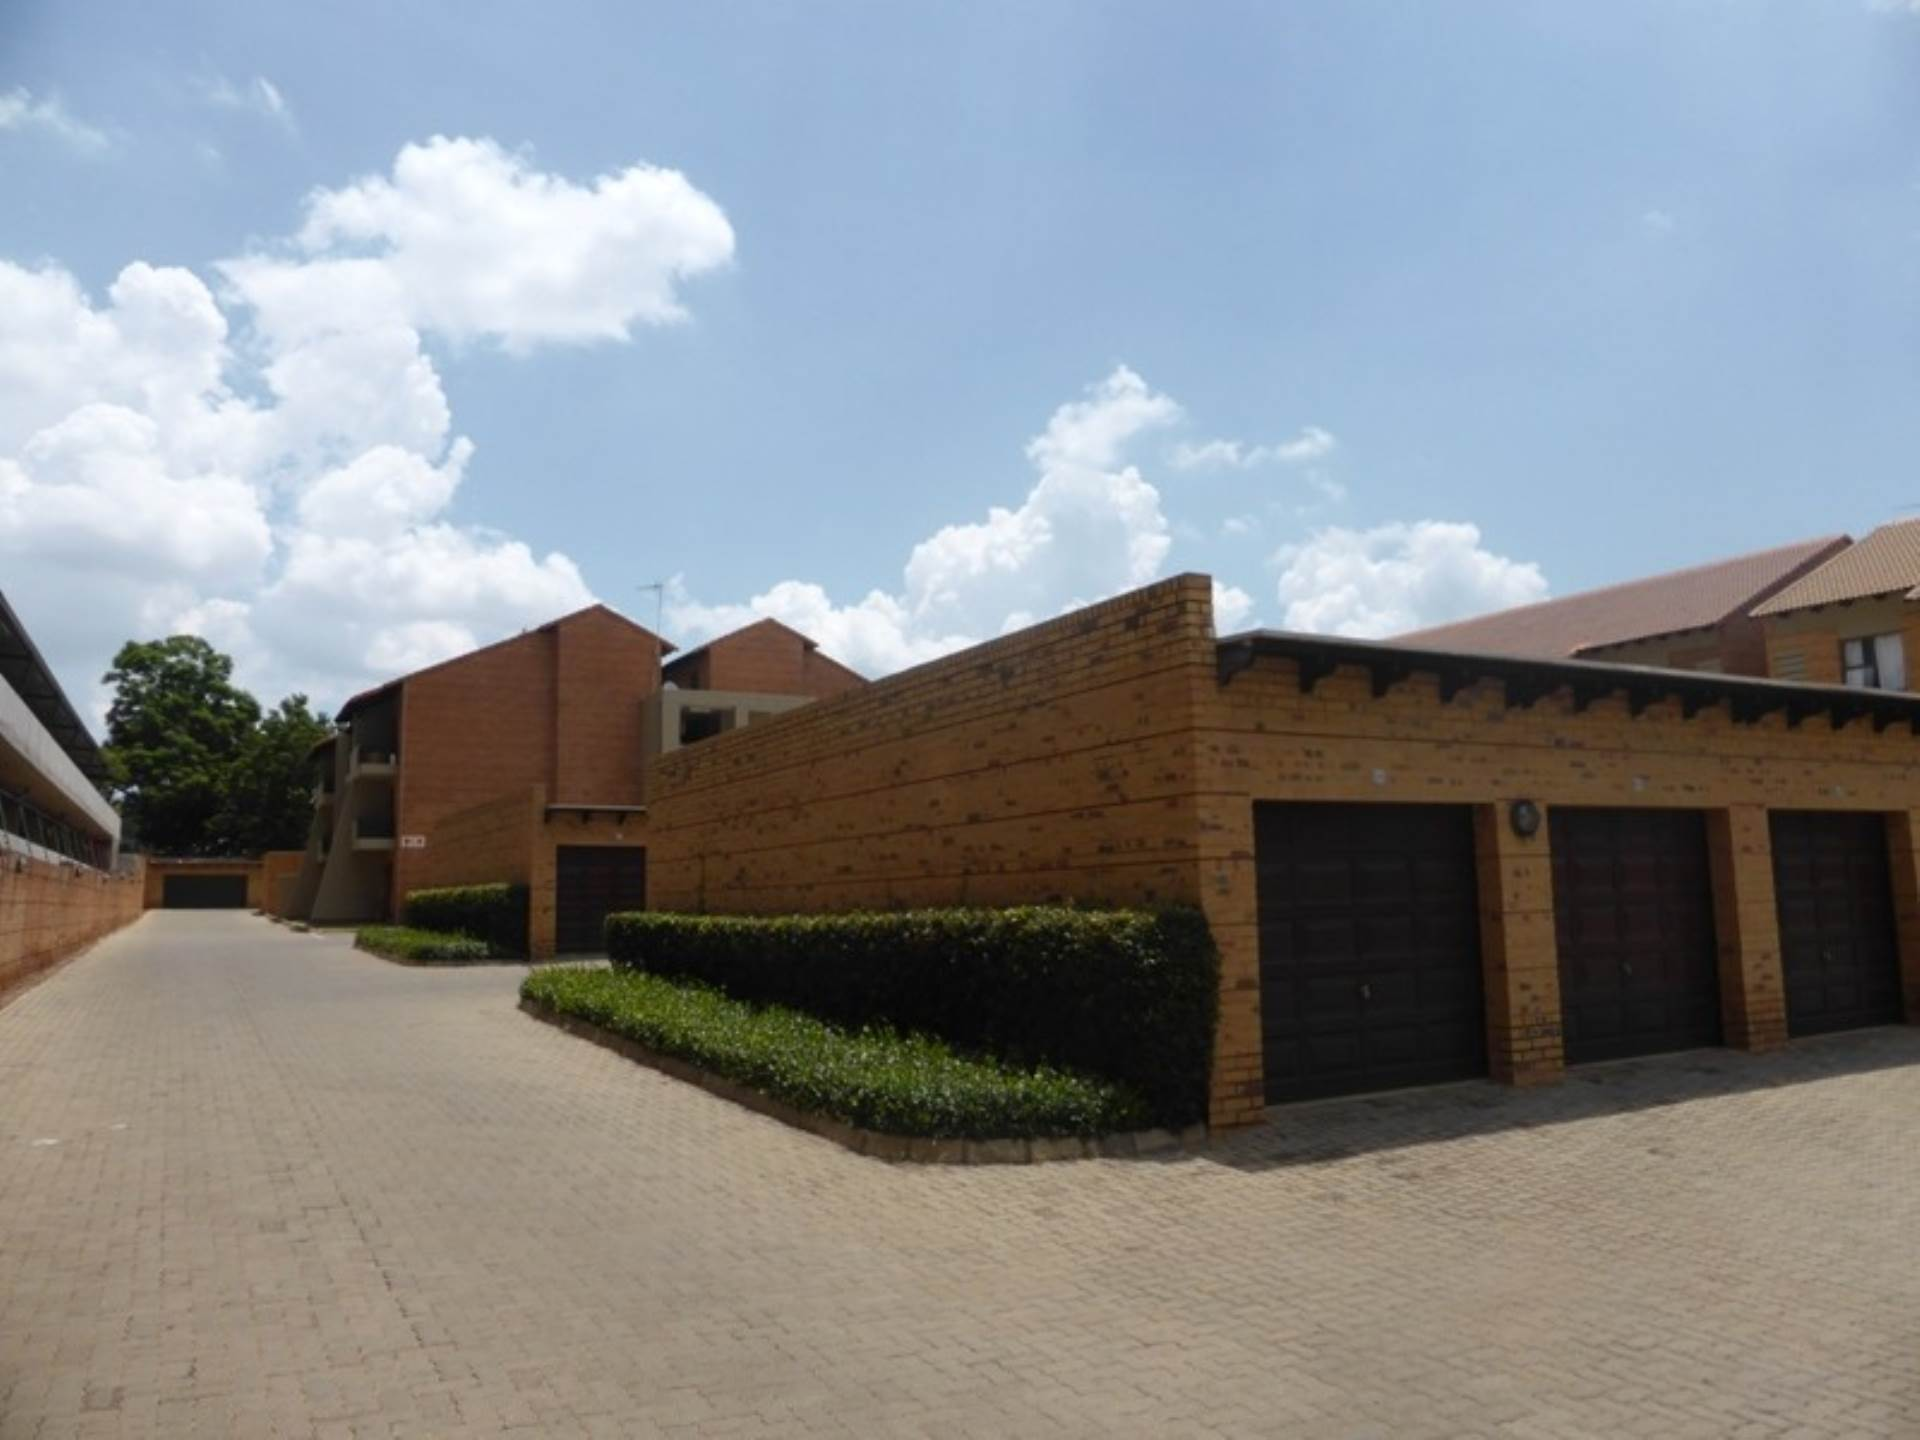 Pretoria, Hatfield Property  | Houses For Sale Hatfield, HATFIELD, Apartment 2 bedrooms property for sale Price:1,480,000